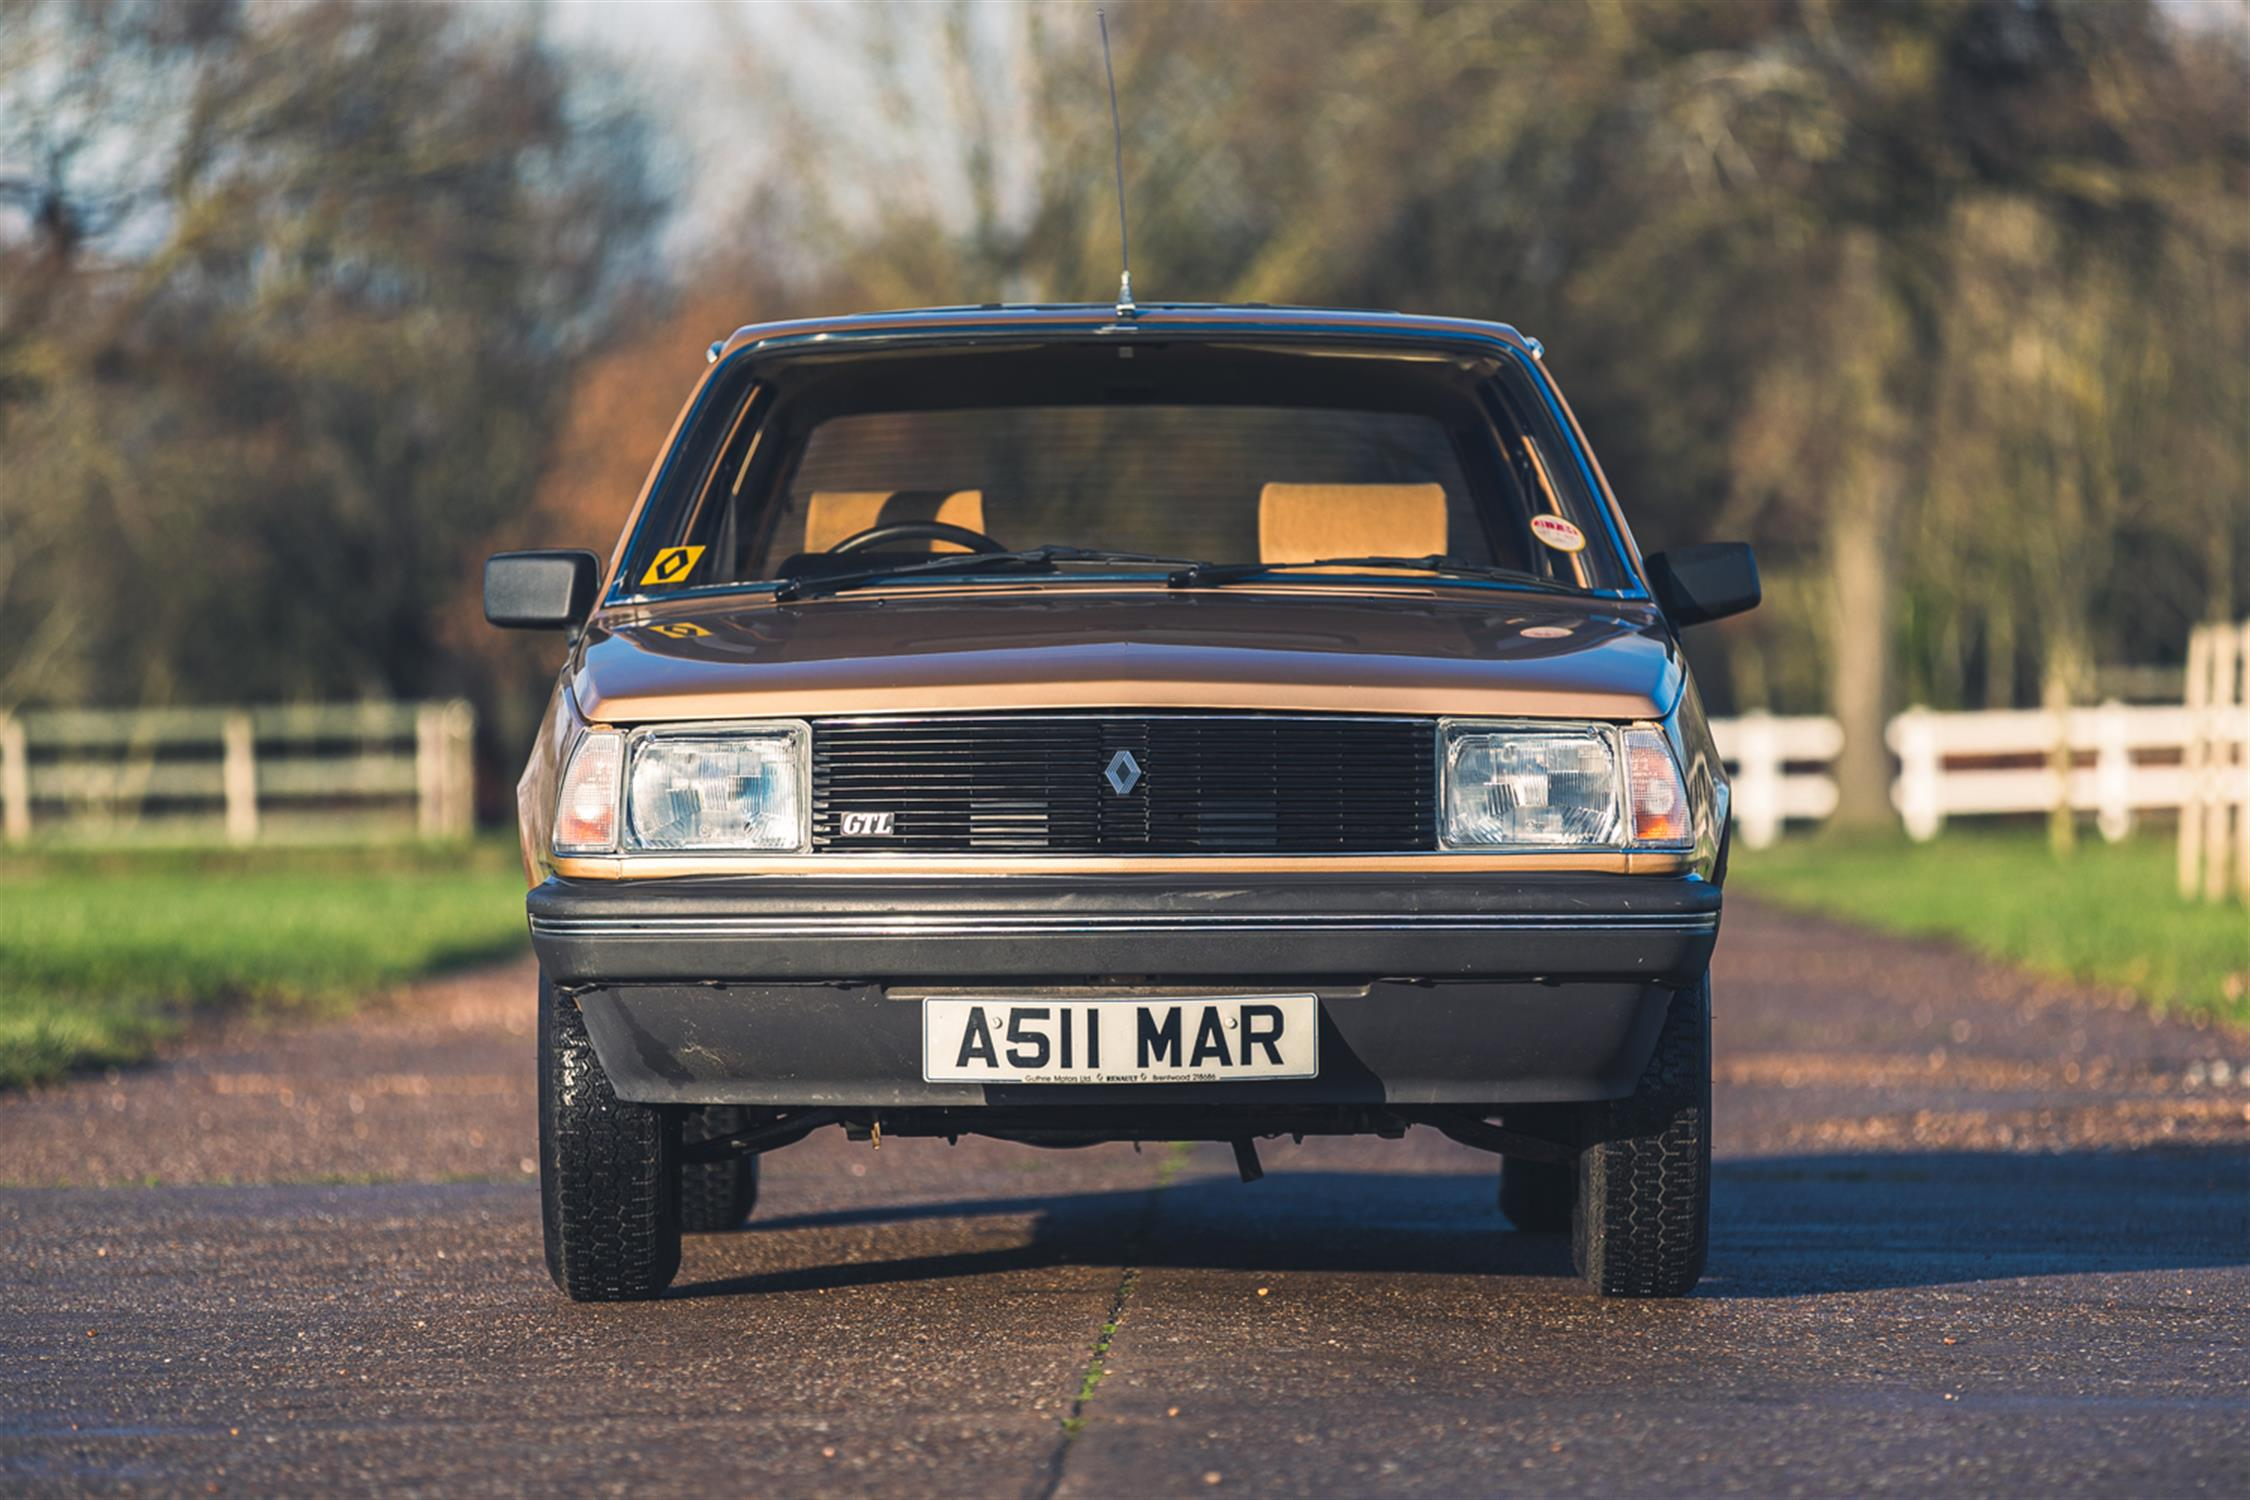 1983 Renault 18 GTL Estate - Image 21 of 32